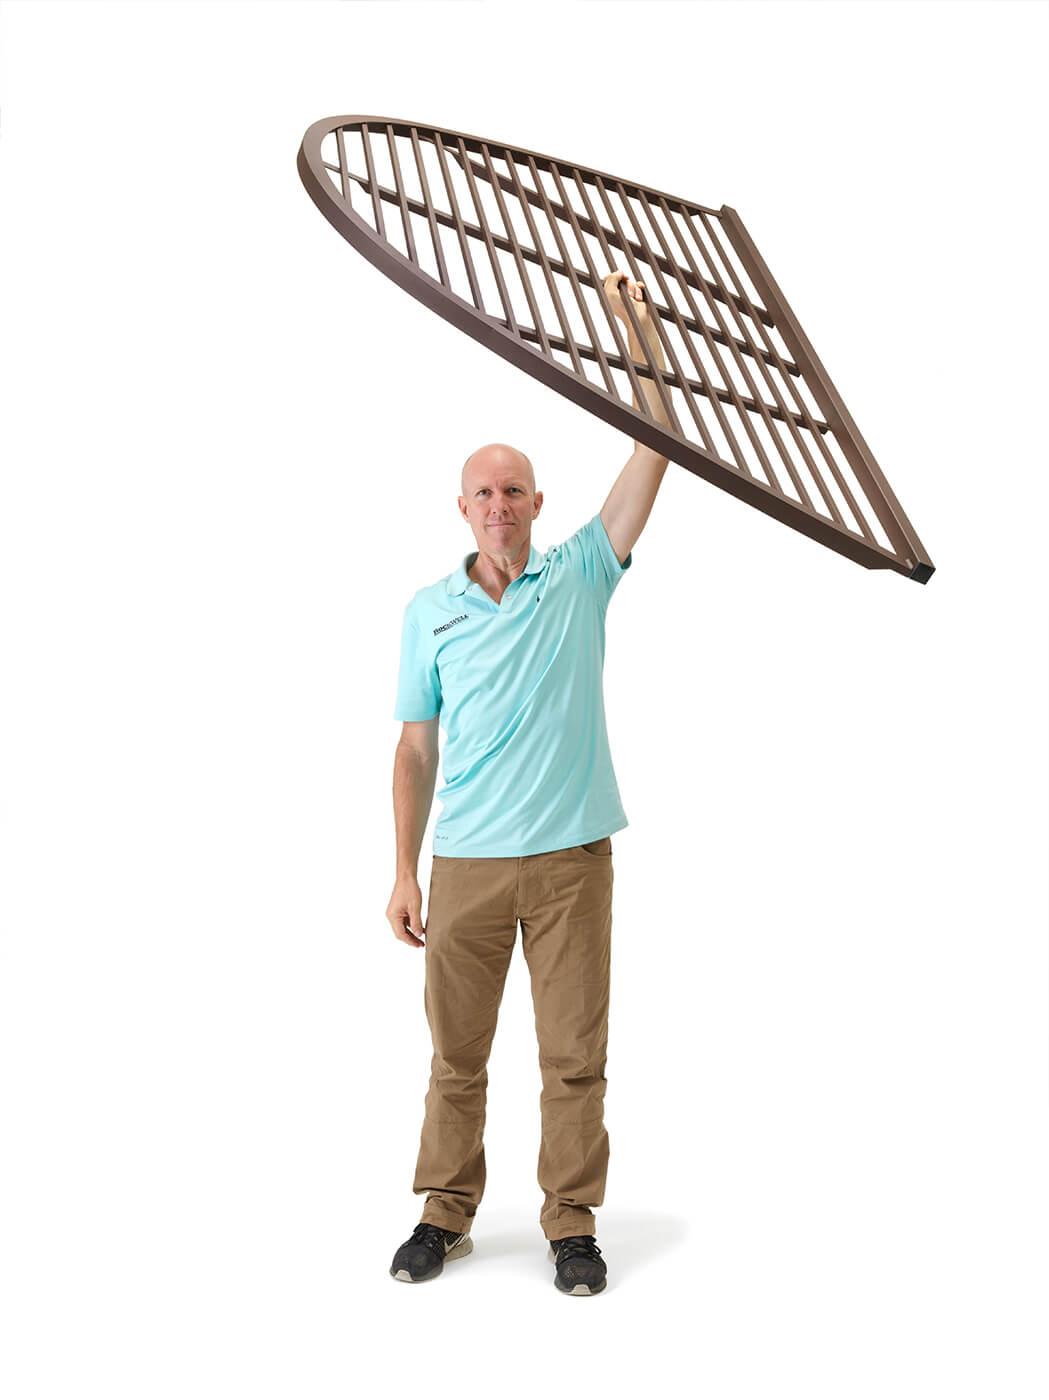 Man holding metal window well grate